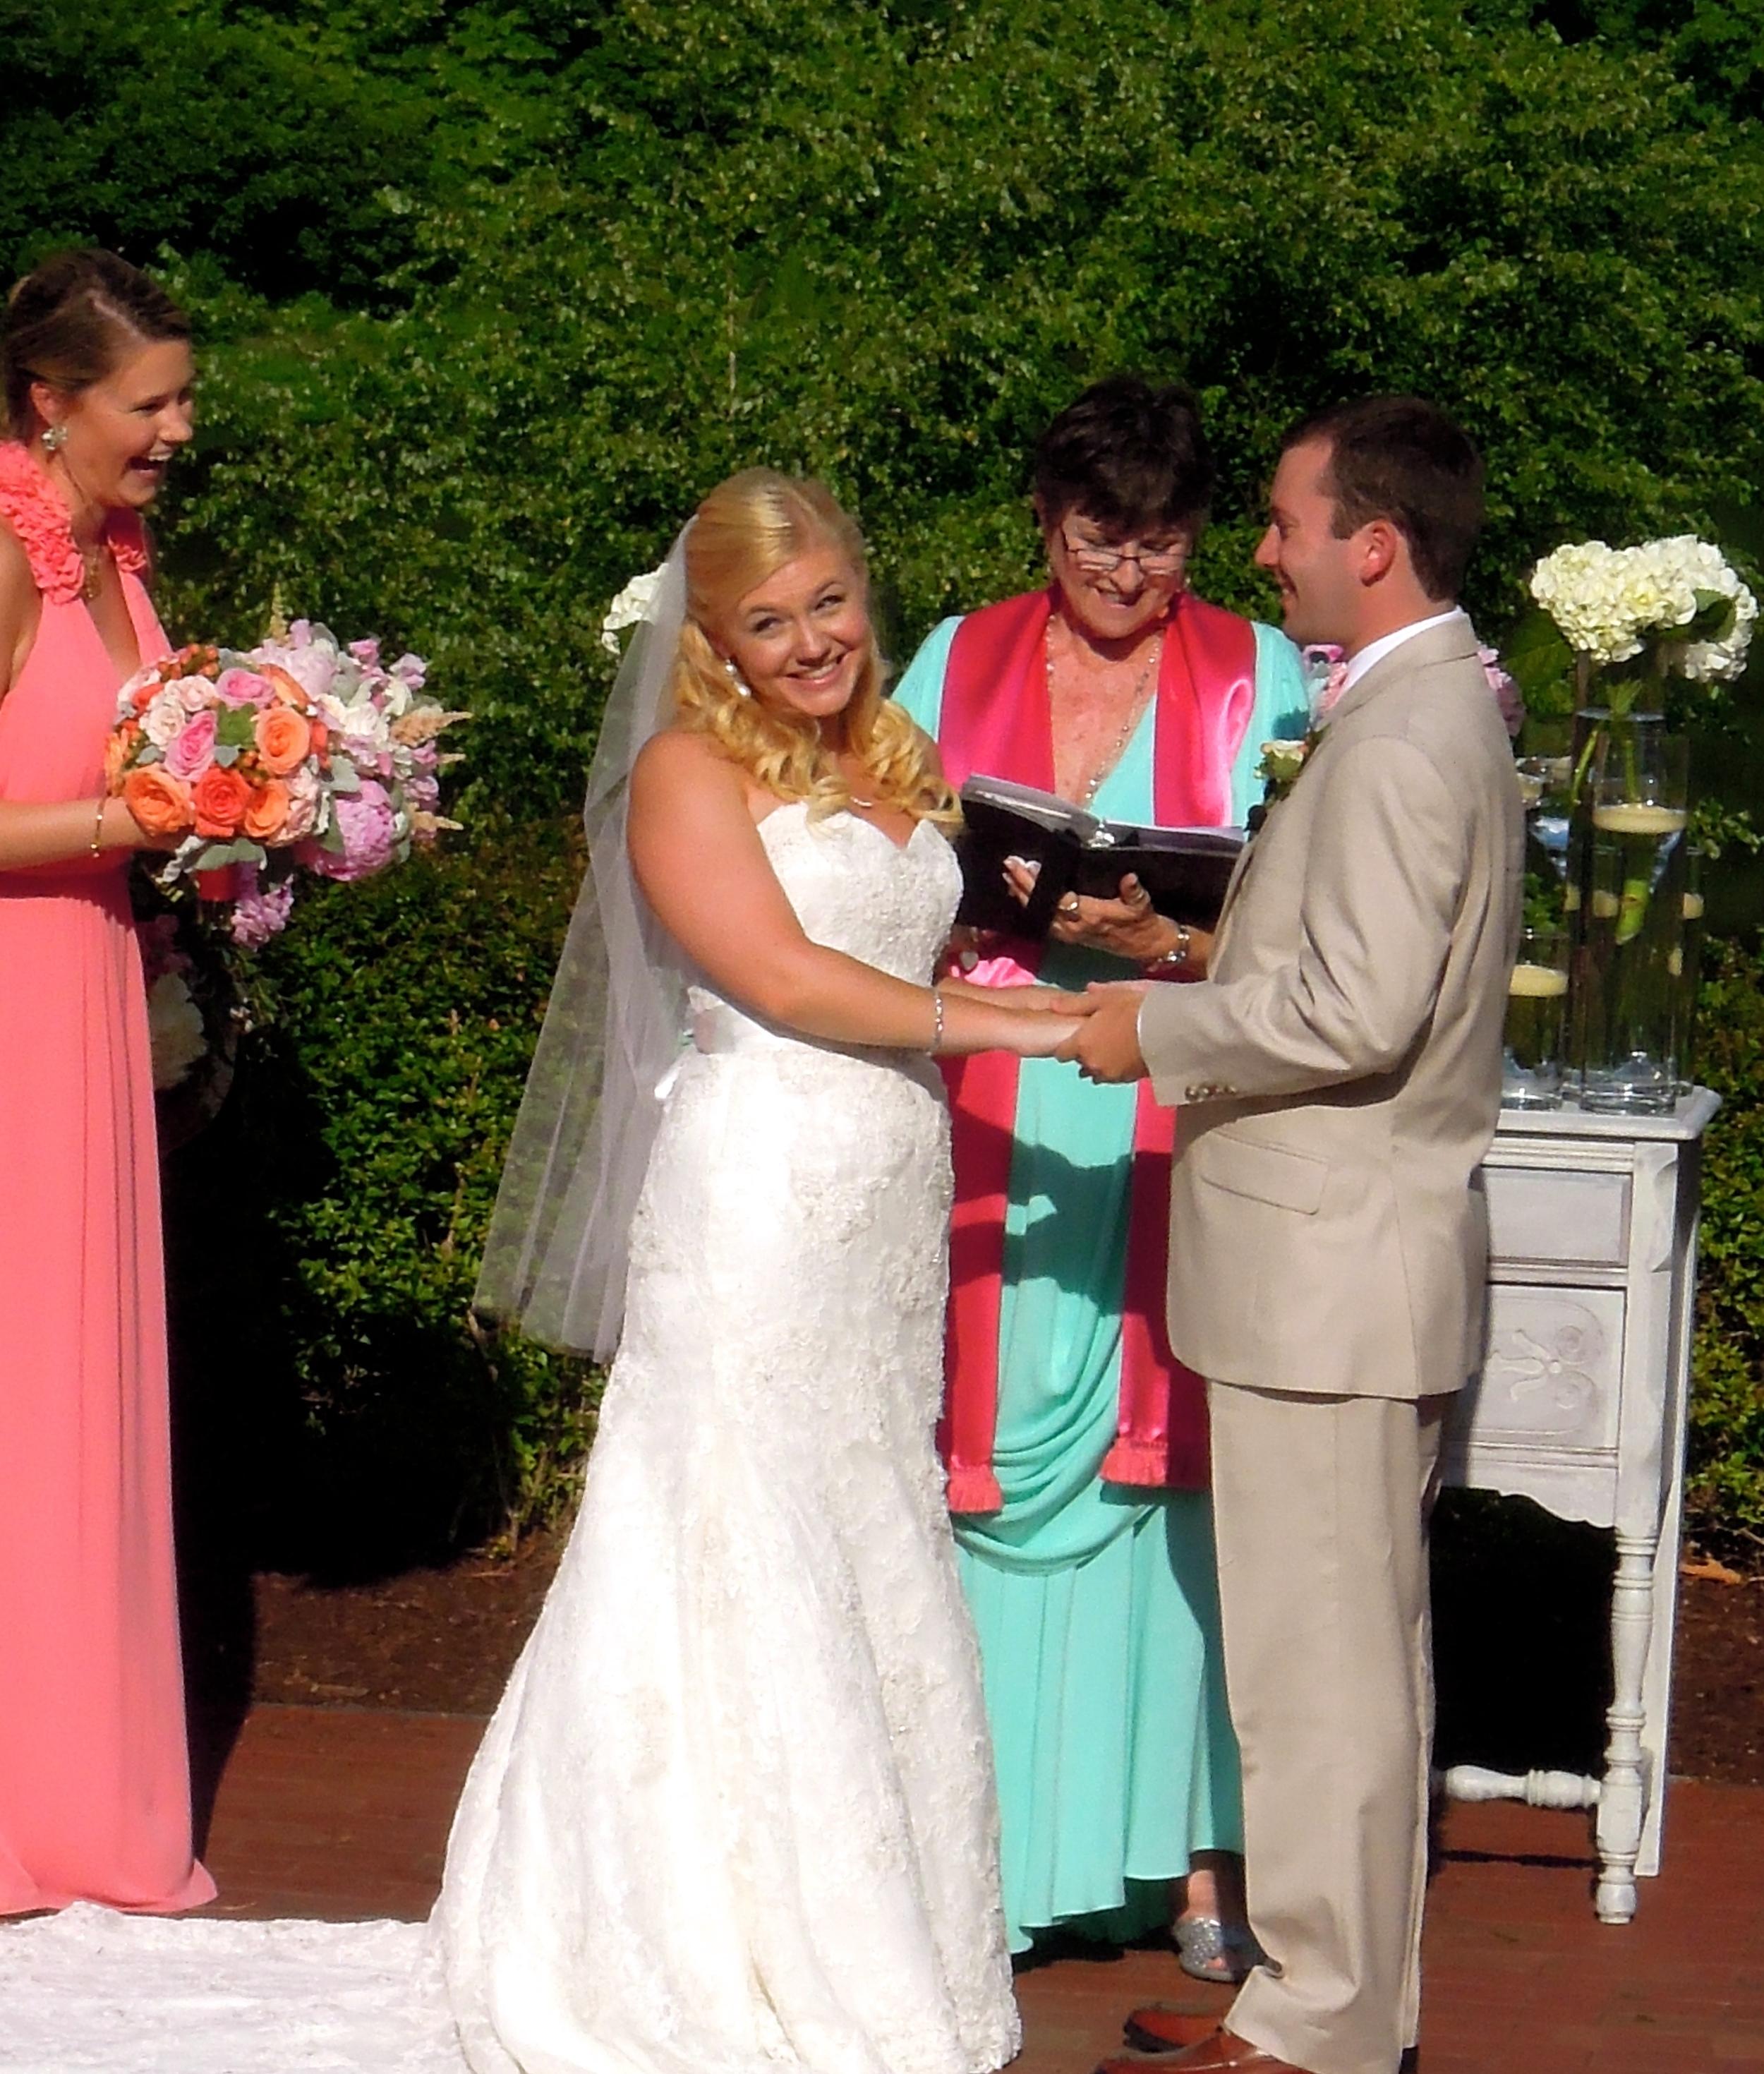 Joyful Wedding at Highgrove Estate in Fuquay Varina NC